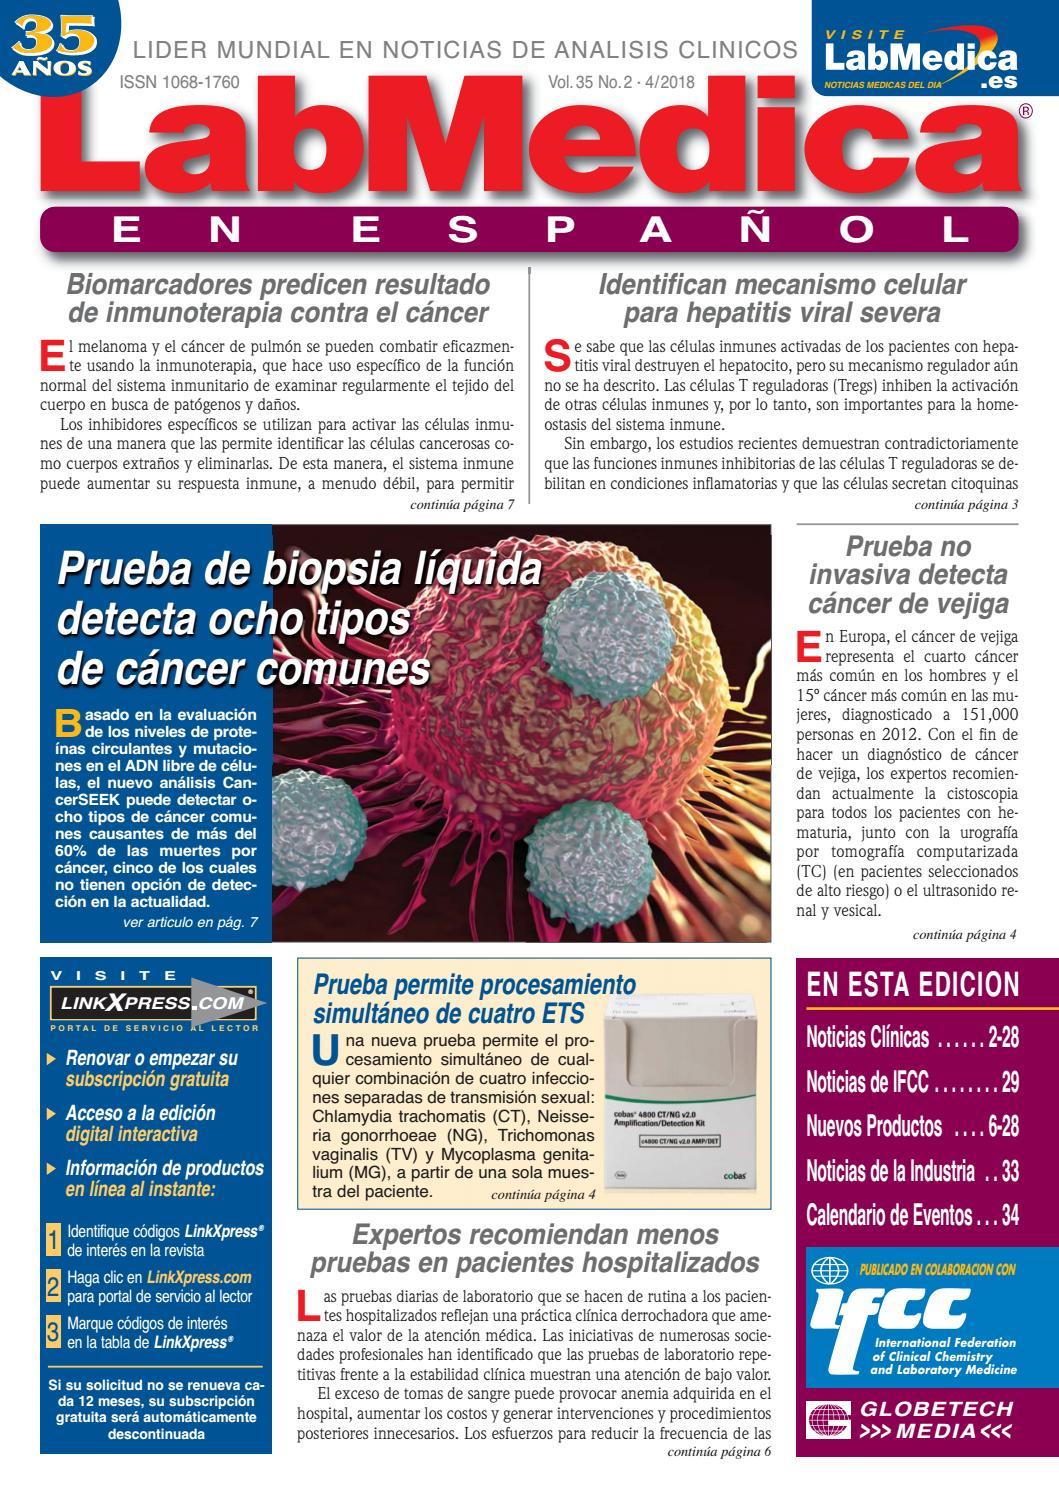 mejores centros de tratamiento de prostatitis en europa 3